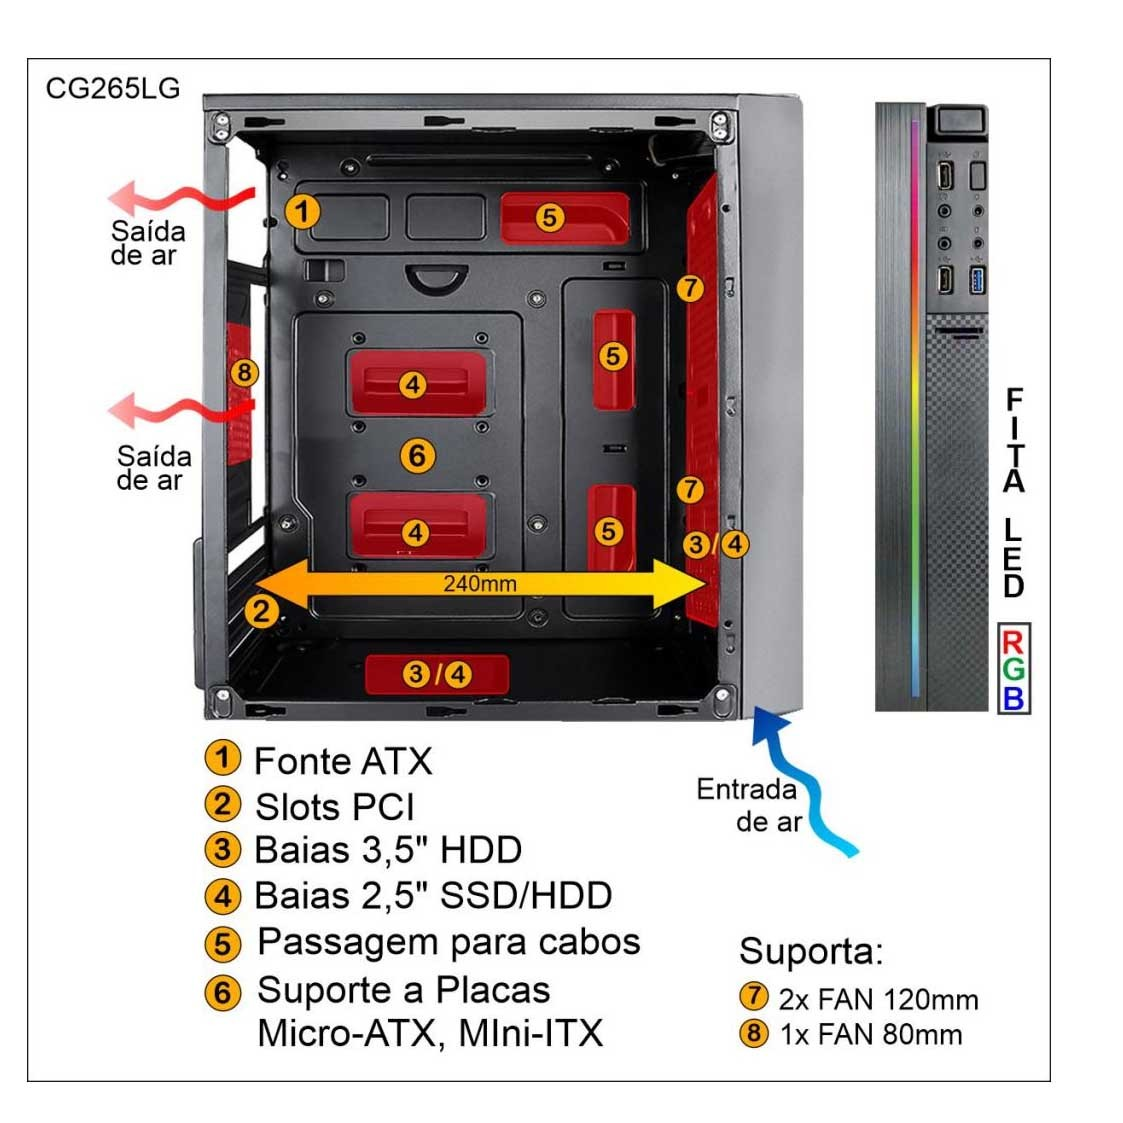 Gabinete Gamer Led RGB Sem Fonte Lateral Acrílico 1 Fan RGB Pixxo - CG265LG